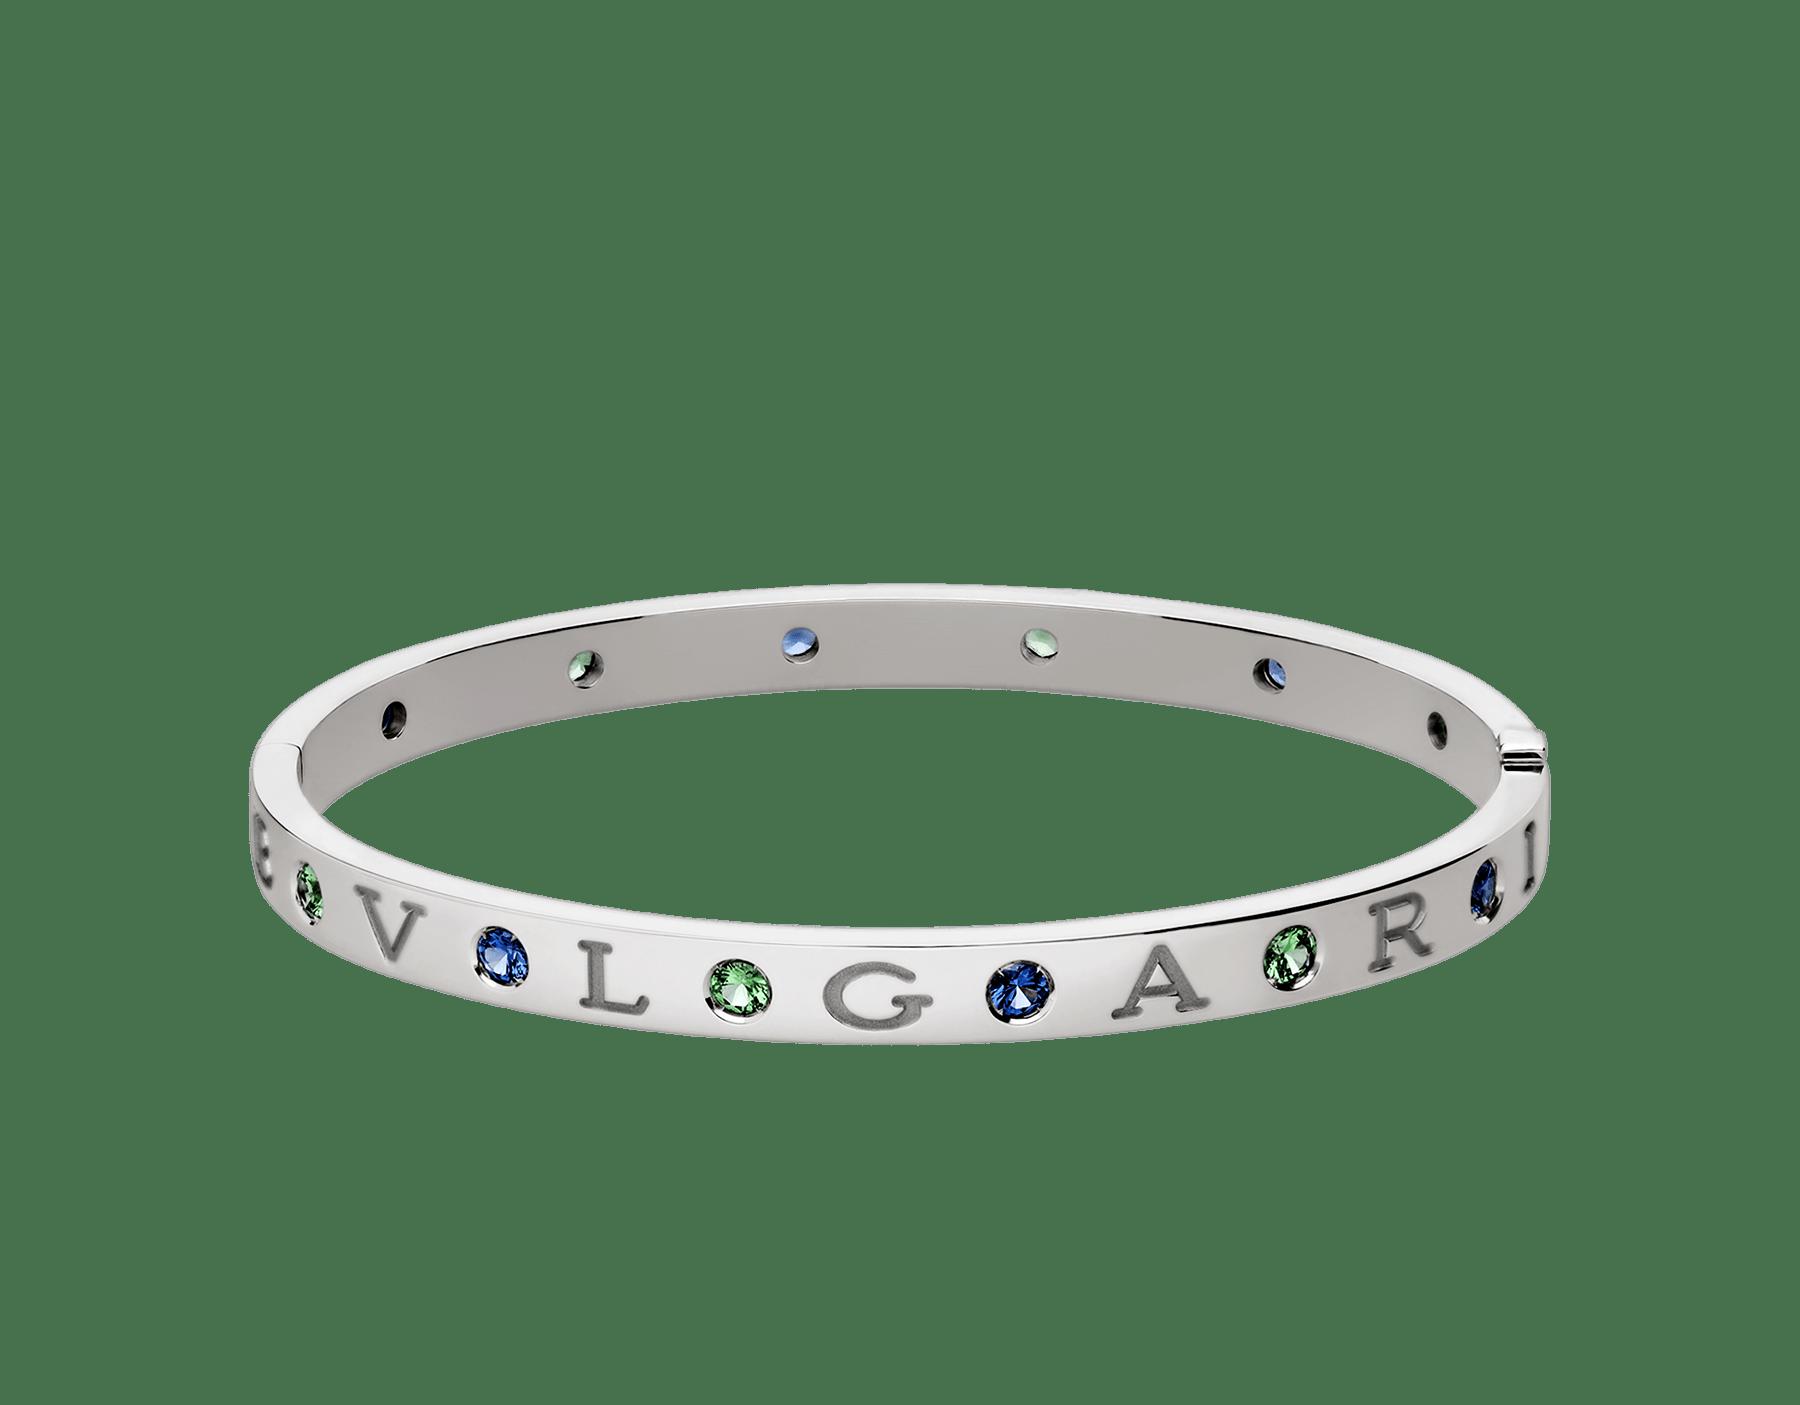 Bracelet jonc BVLGARI BVLGARI en or blanc 18K serti de six saphirs et six tsavorites BR857636 image 2